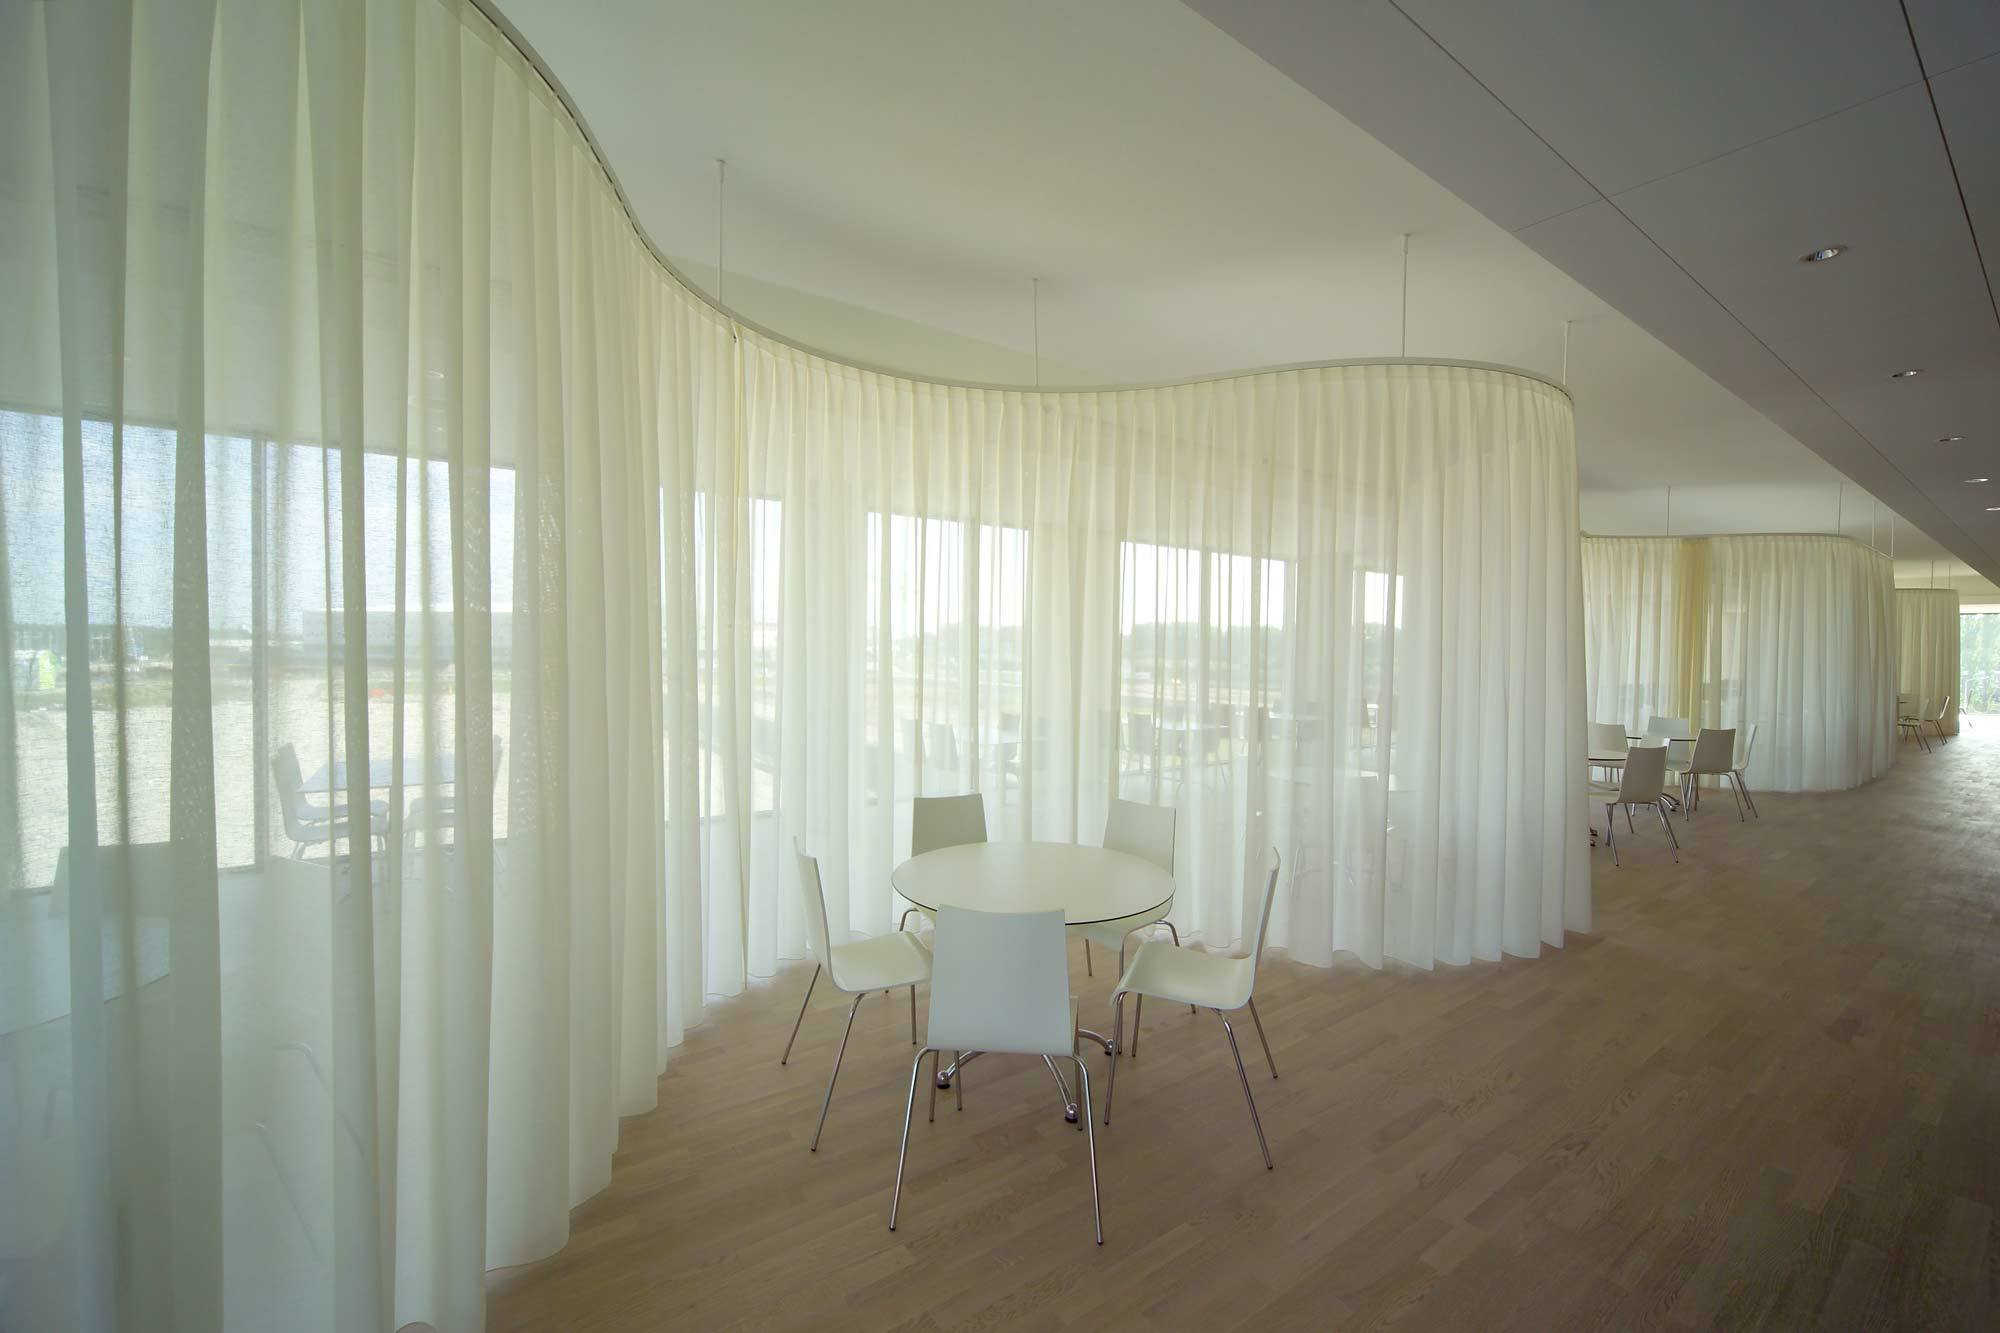 Bürogebäude Menzis, de Architekten Cie., Groningen, 2005, Foto: Allard van der Hoek